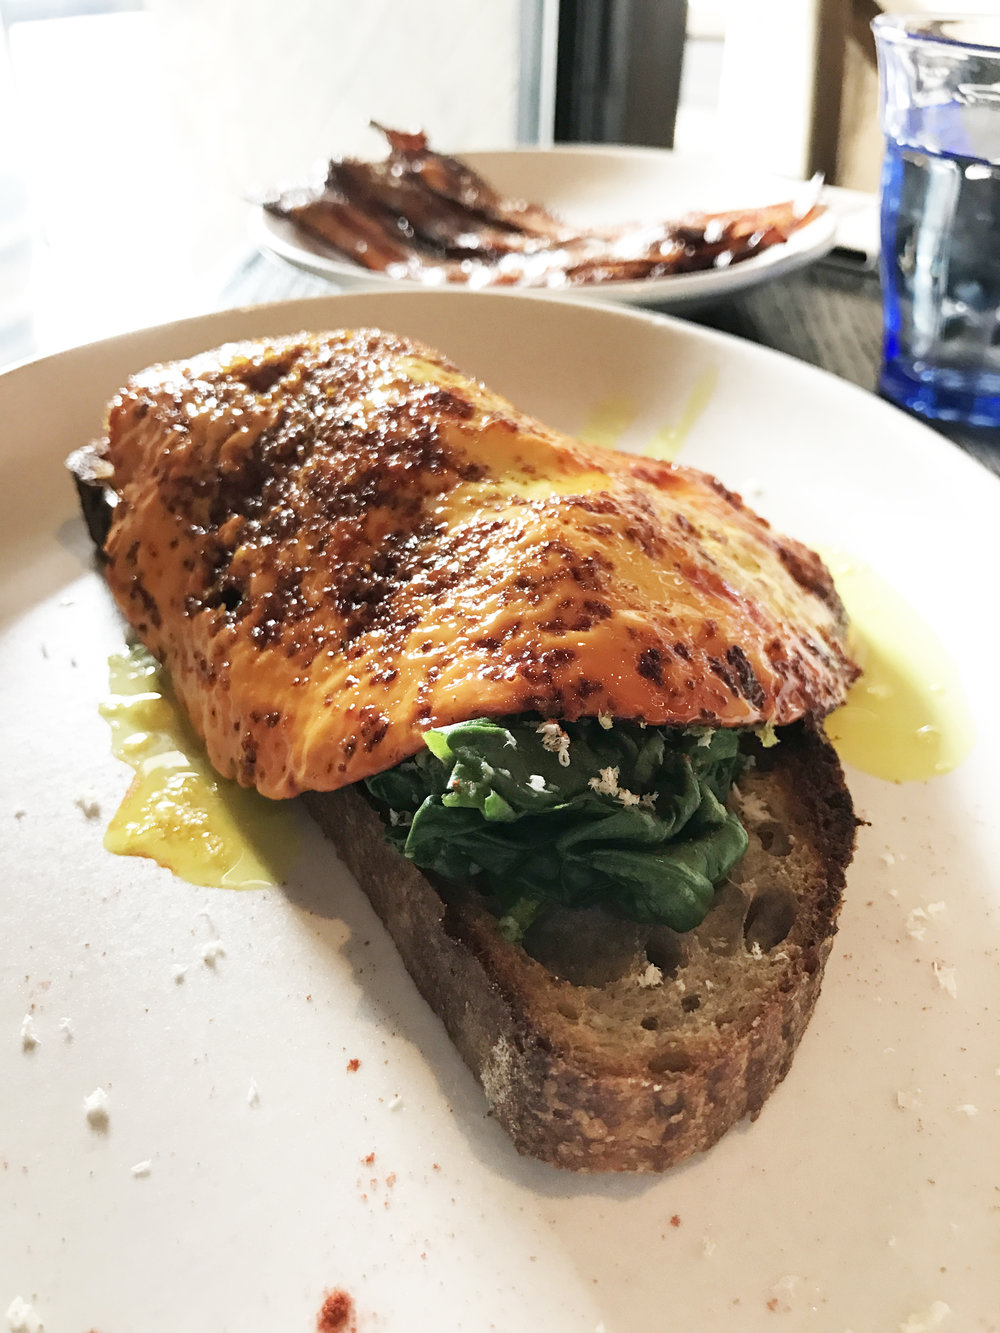 Golden Eggs - lodge toast, avocado, spinach, horseradish, turmeric, coconut oil